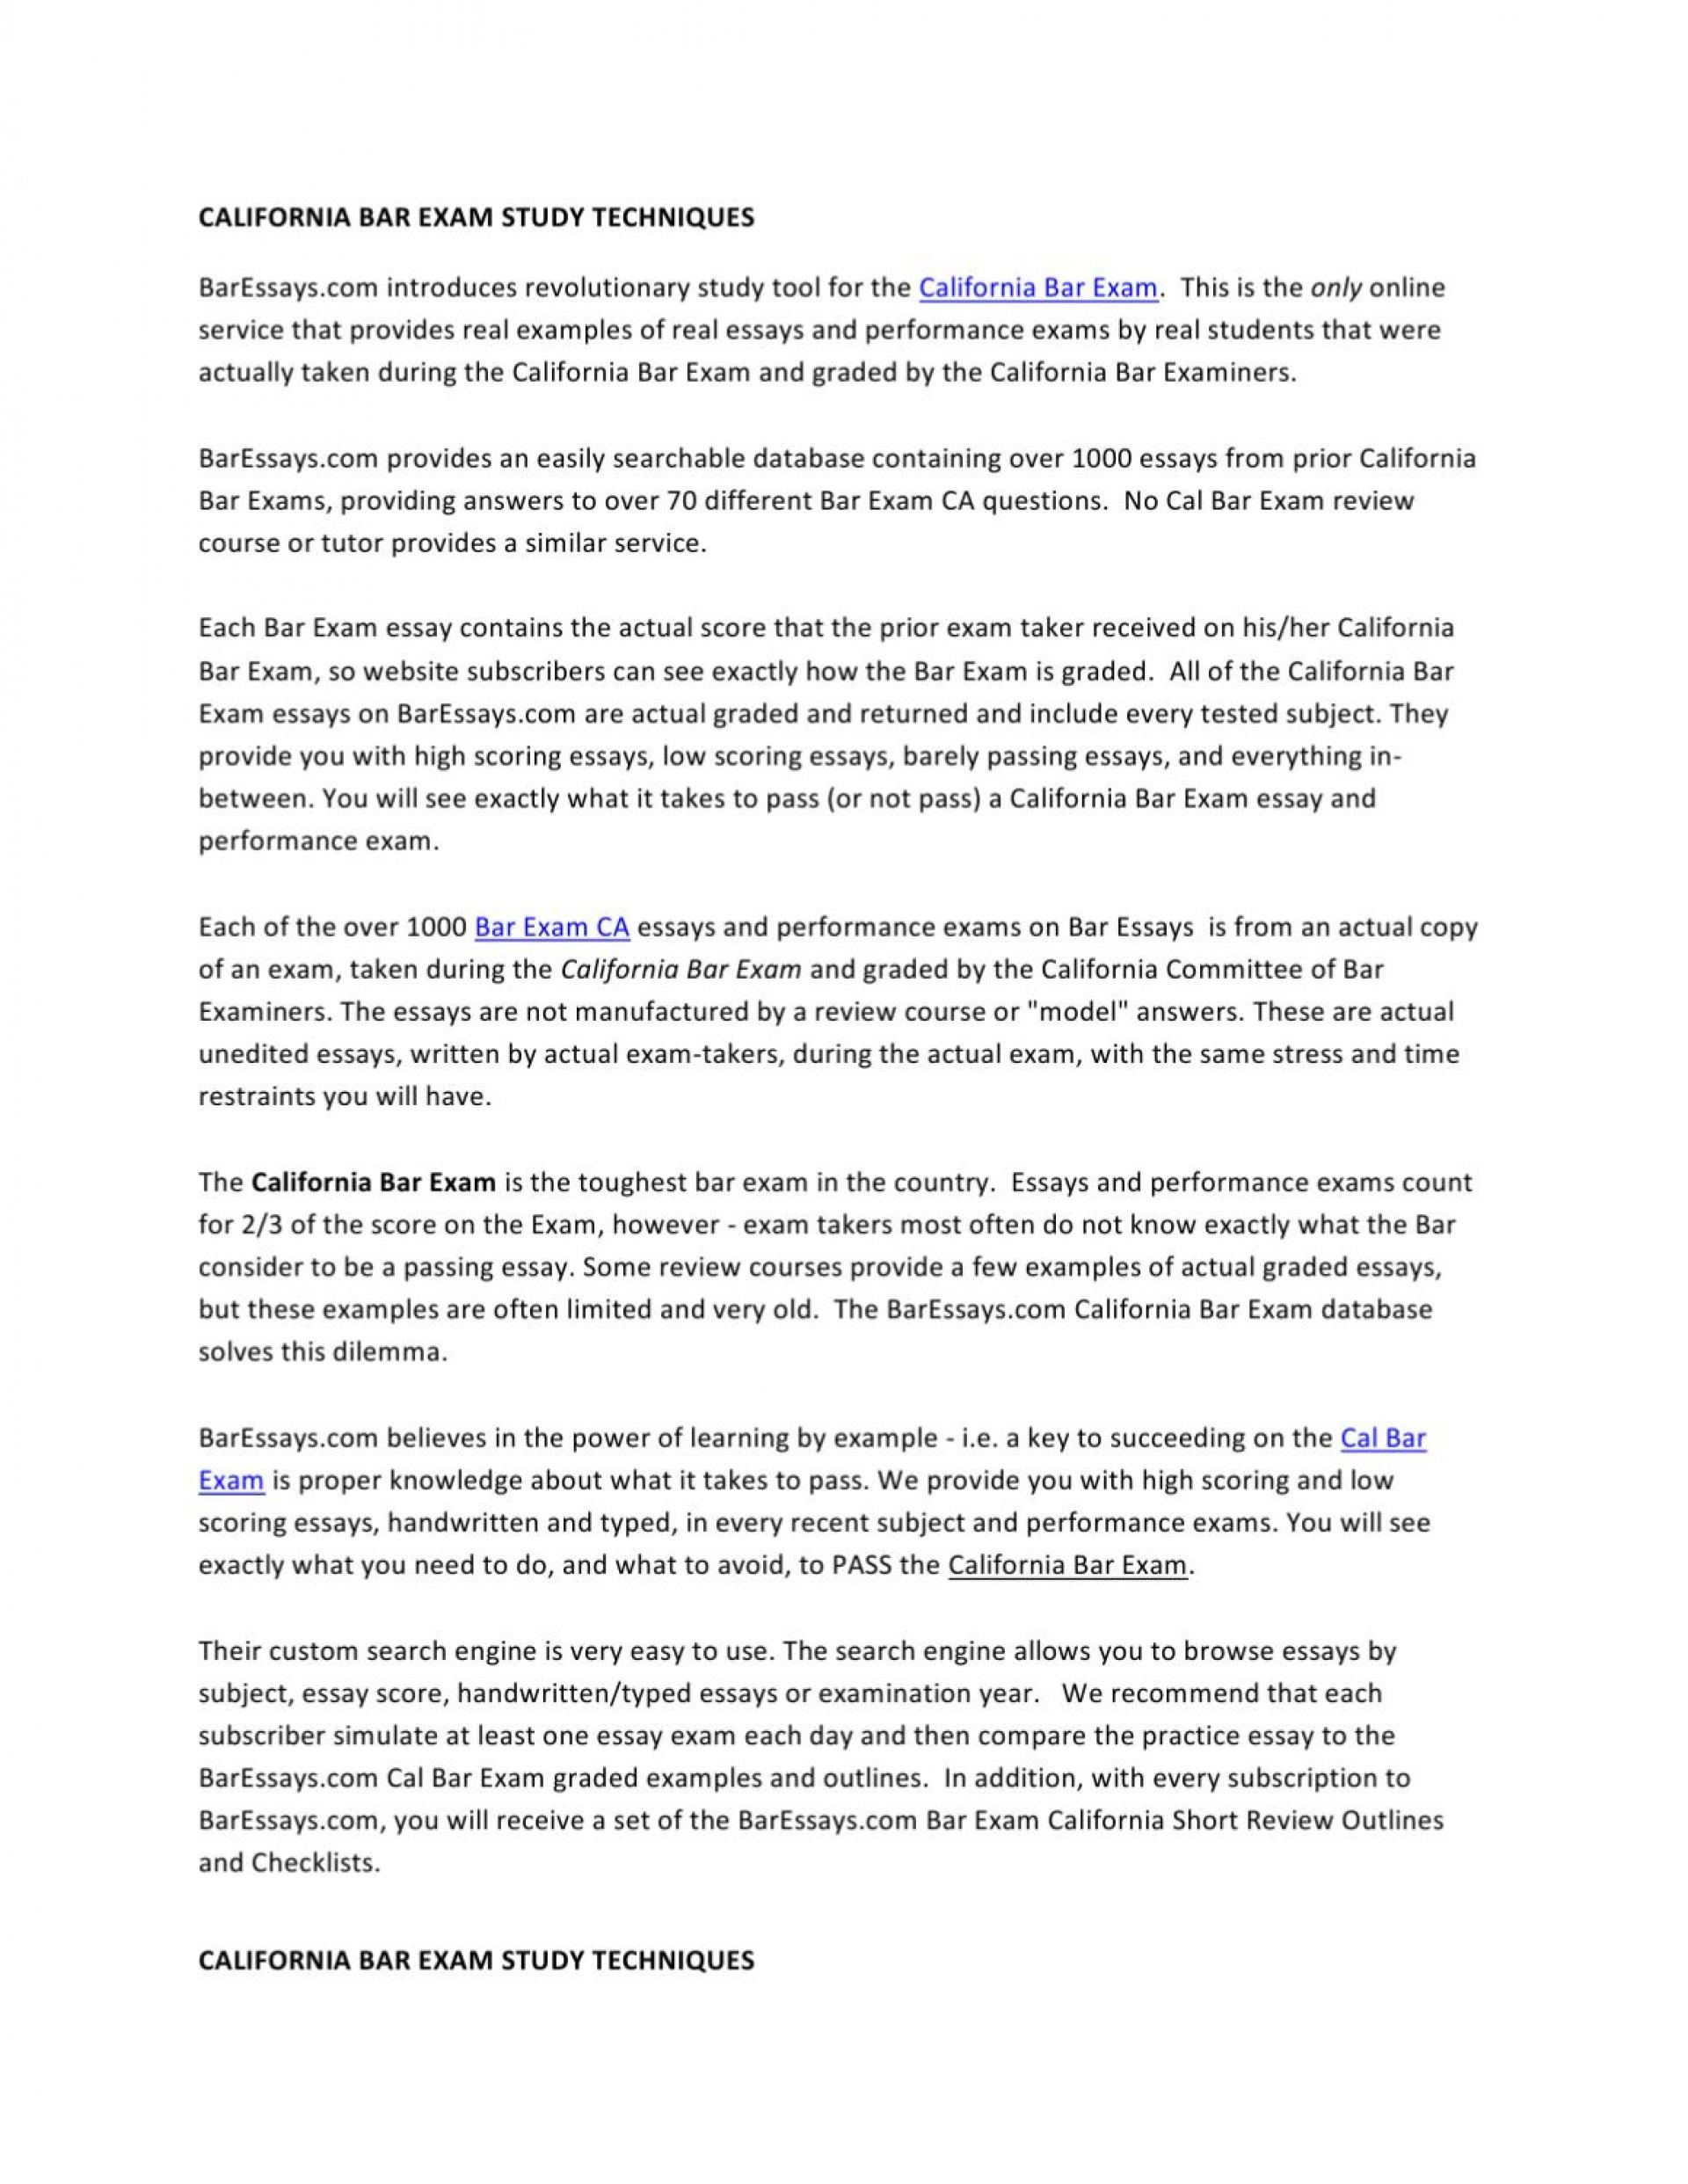 028 Essay Example California Bar Essays Page 1 Marvelous Exam Graded February 2018 How Are 1920